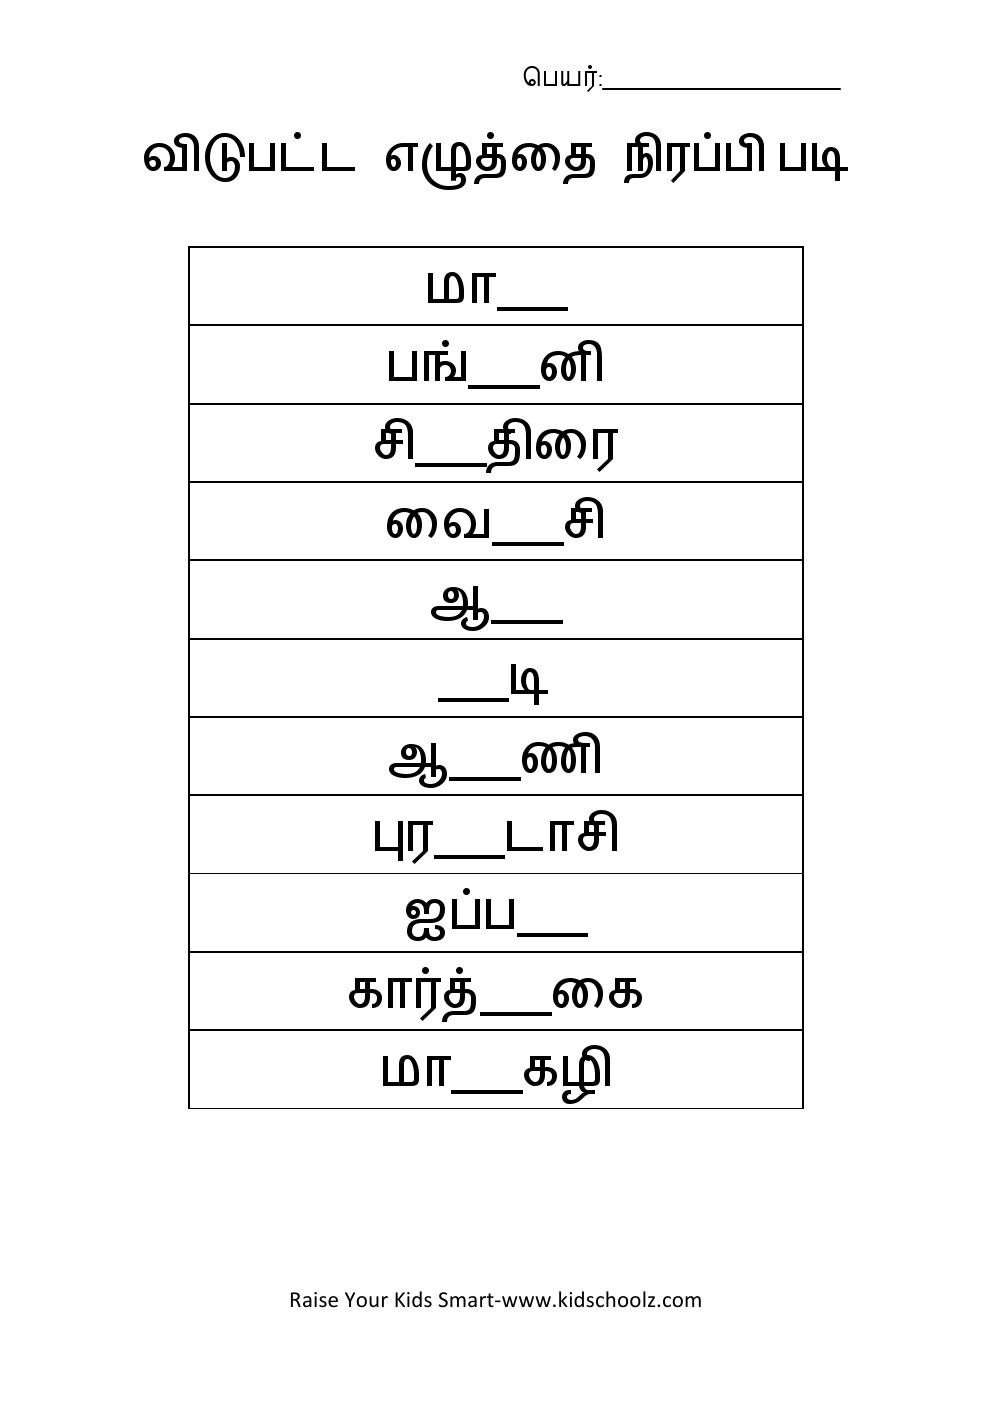 Workbooks tamil handwriting practice worksheets : Wonderful Tamil Alphabets Worksheets For Kids Learning Sheets ...